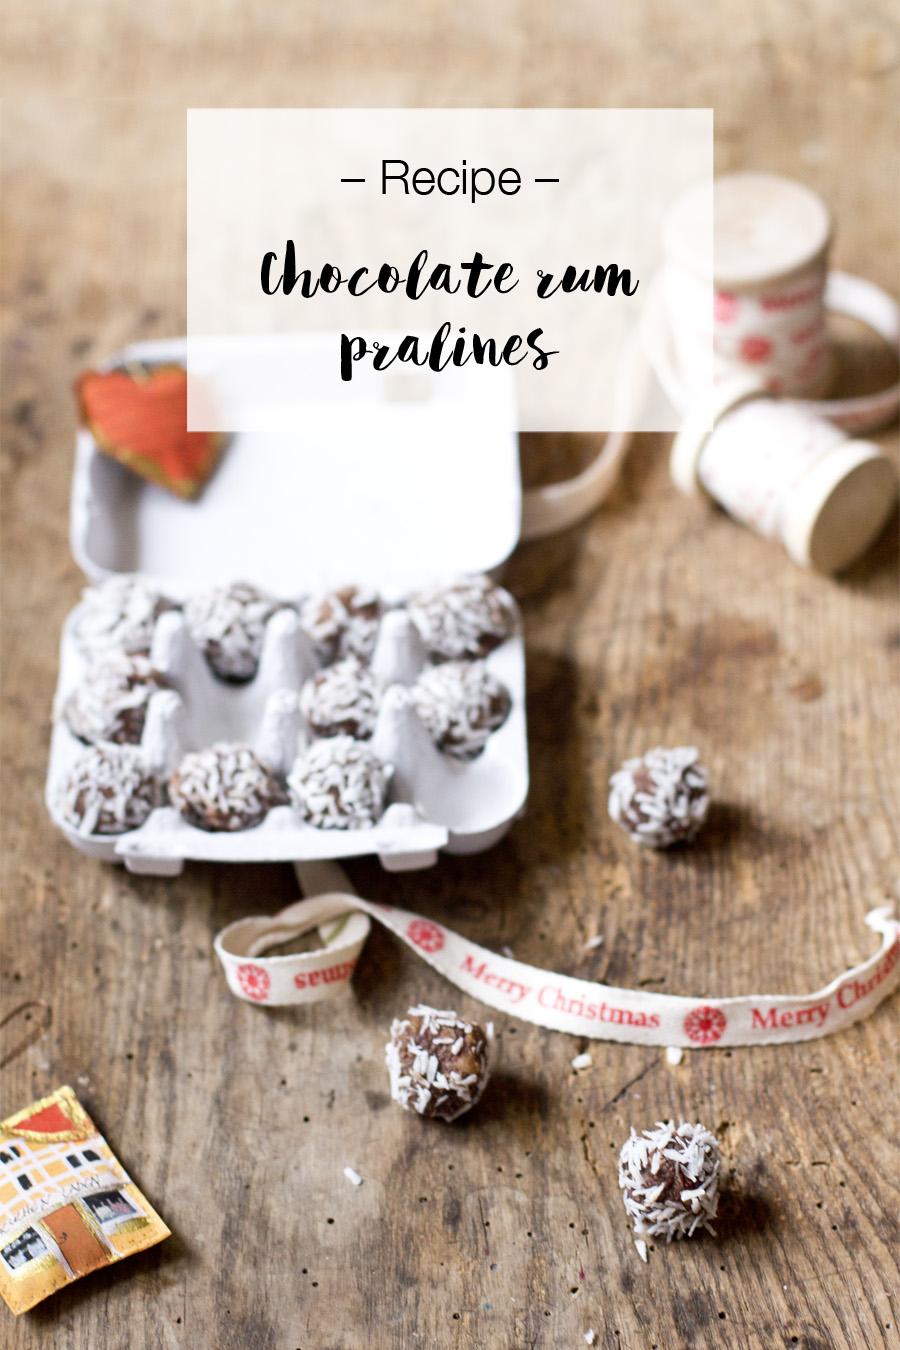 Chocolate rum pralines | LOOK WHAT I MADE ...